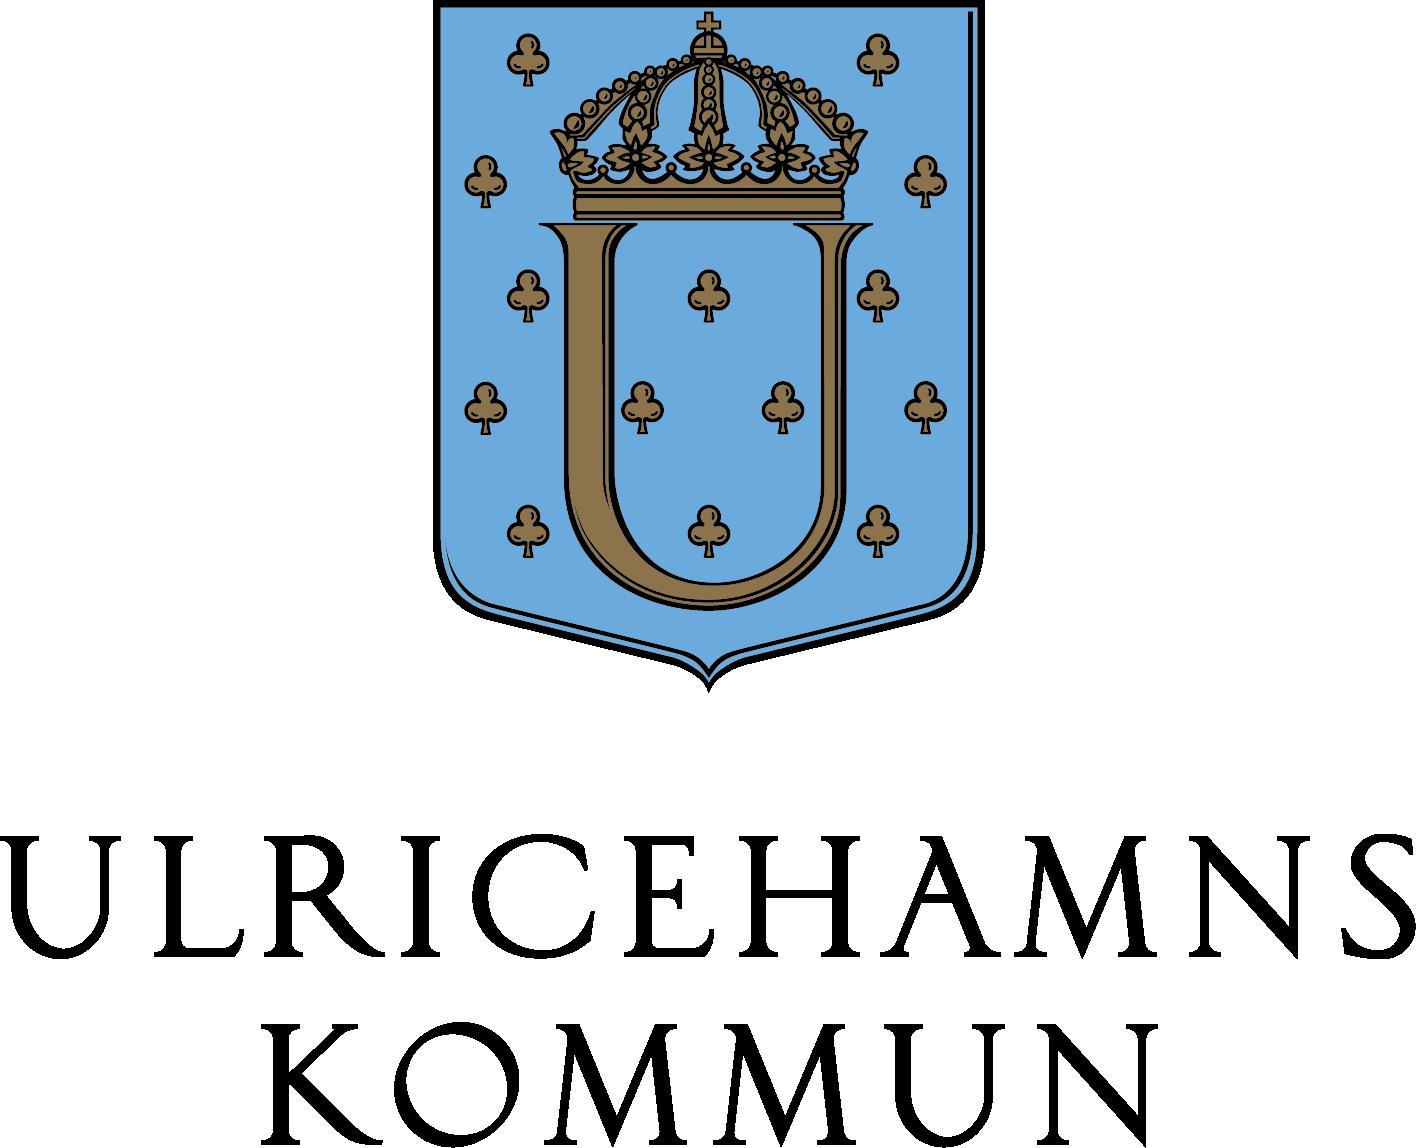 Ulricehamns kommuns logotyp - stående svart text